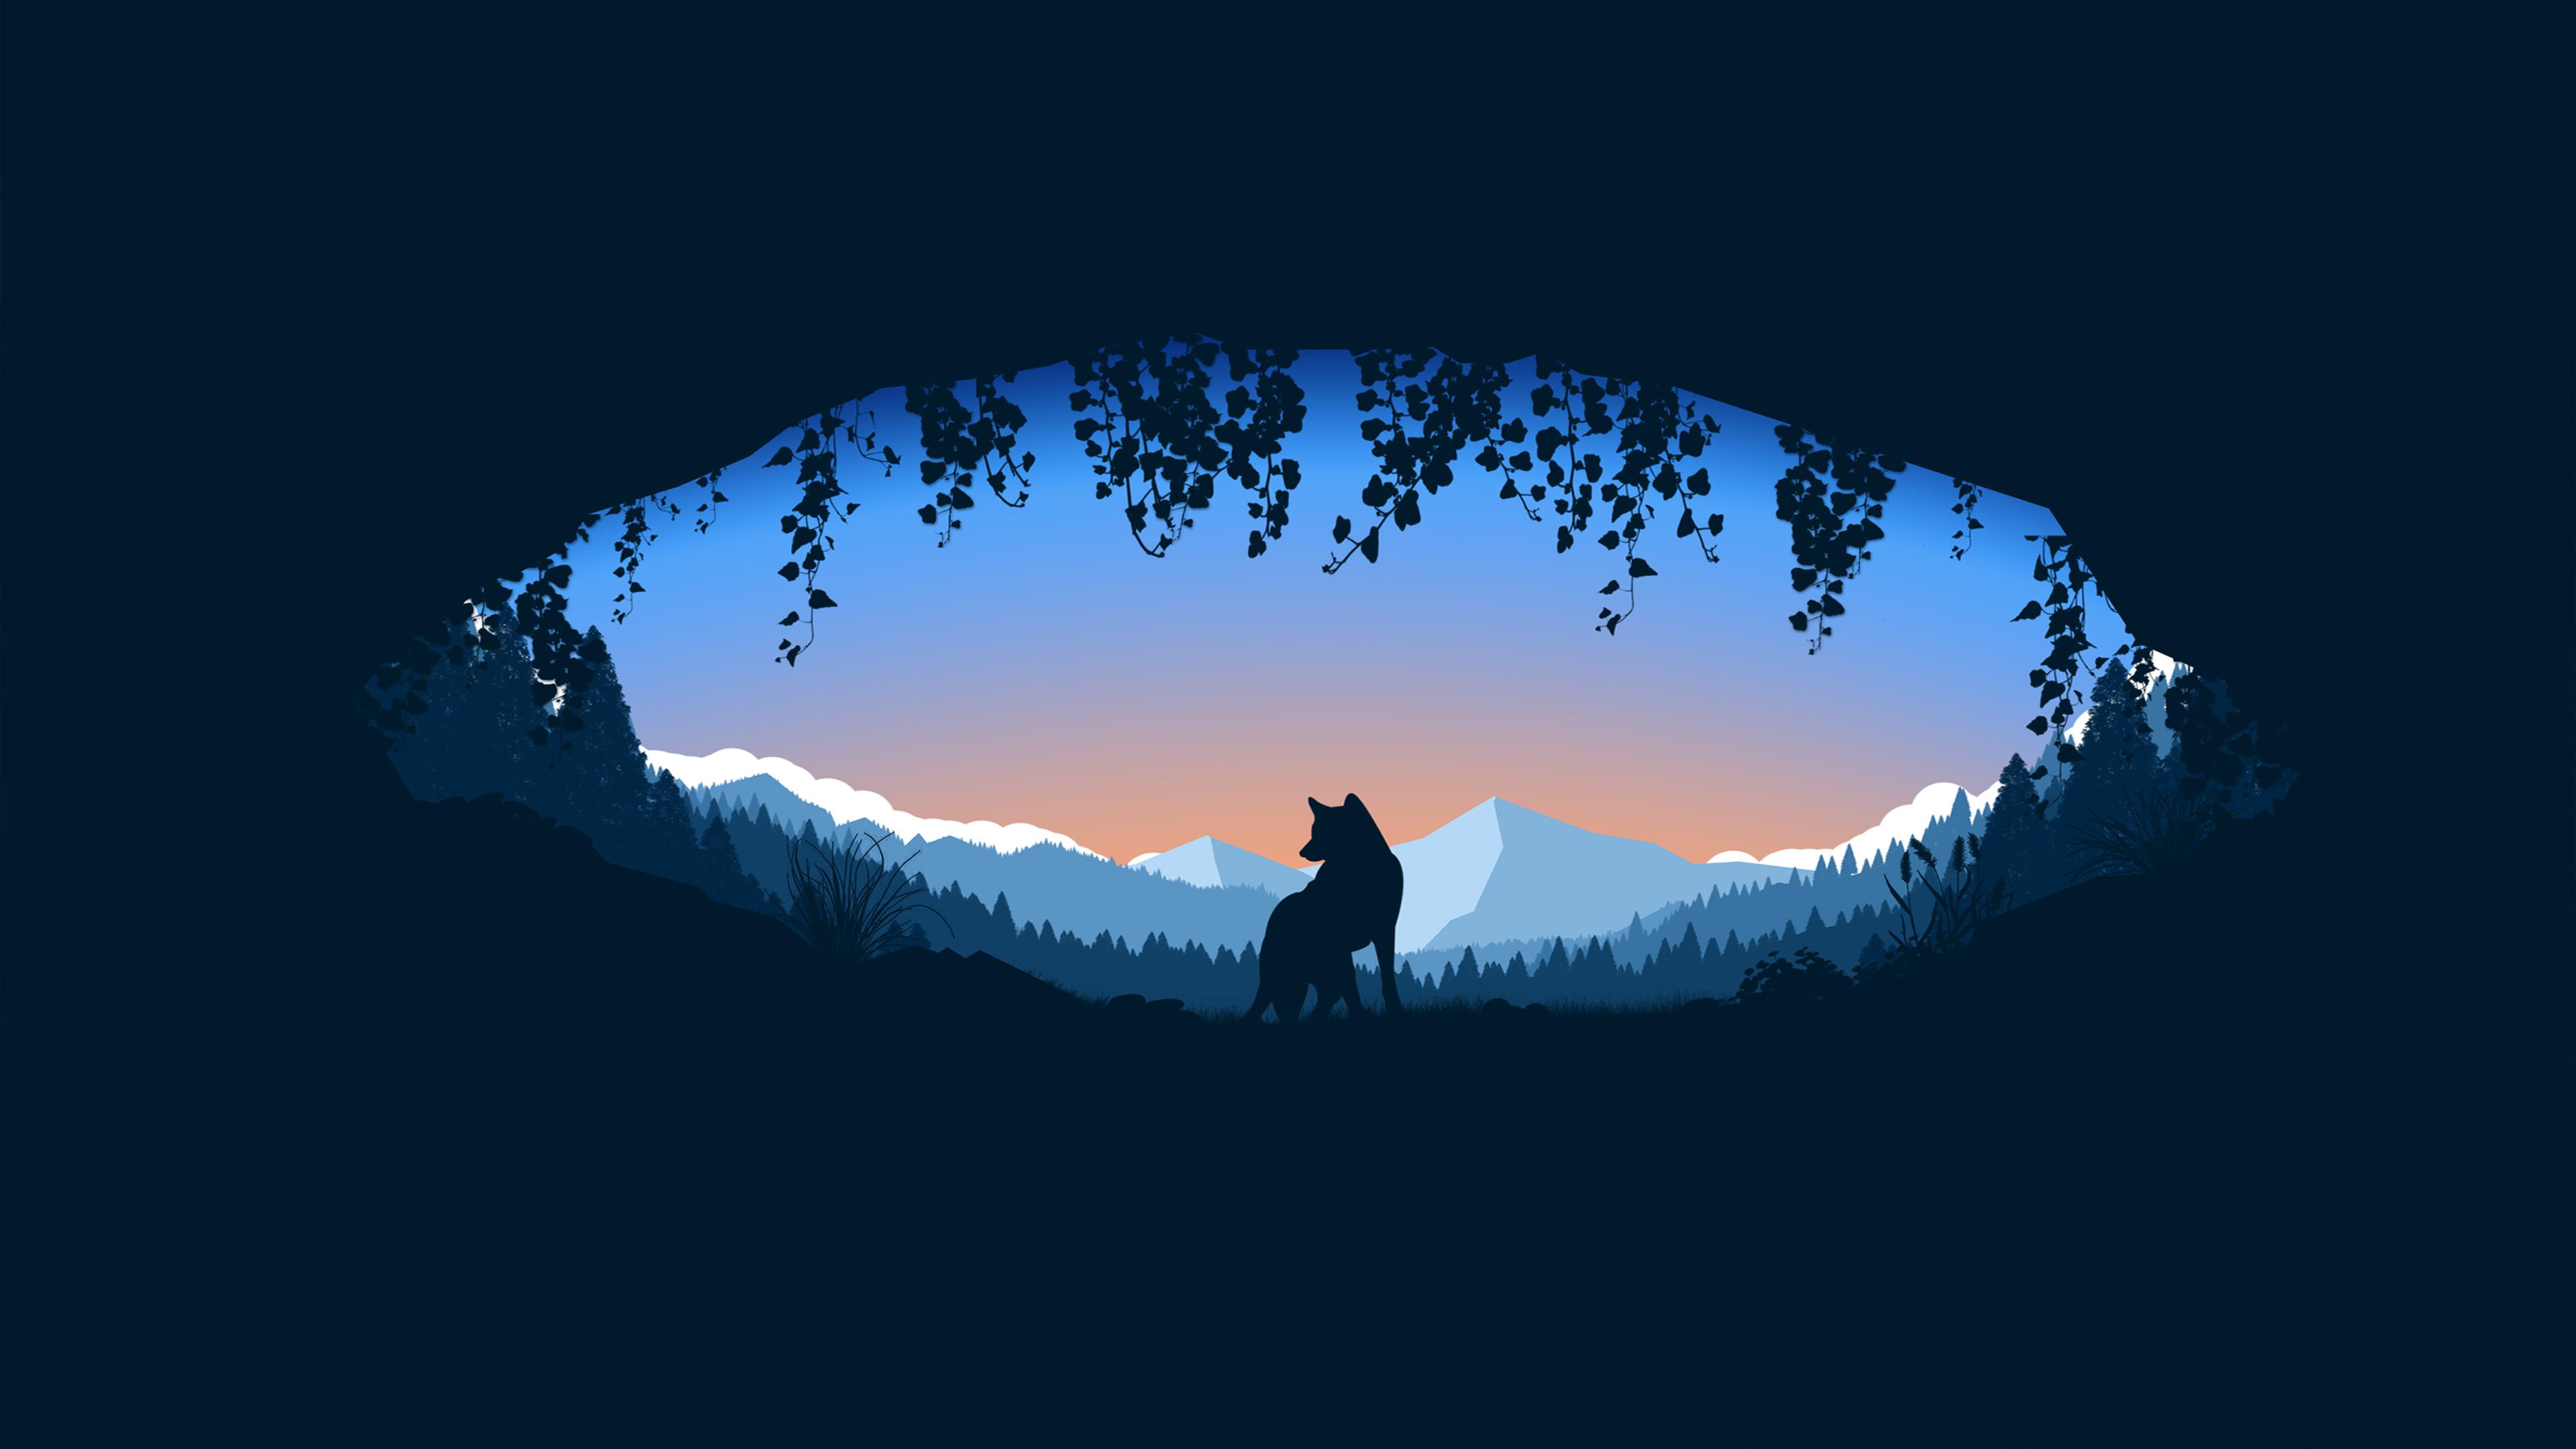 Recovery Mountain Minimalist 4k Hd Desktop Wallpaper For: Wolf Cave Minimalist 4k, HD Artist, 4k Wallpapers, Images